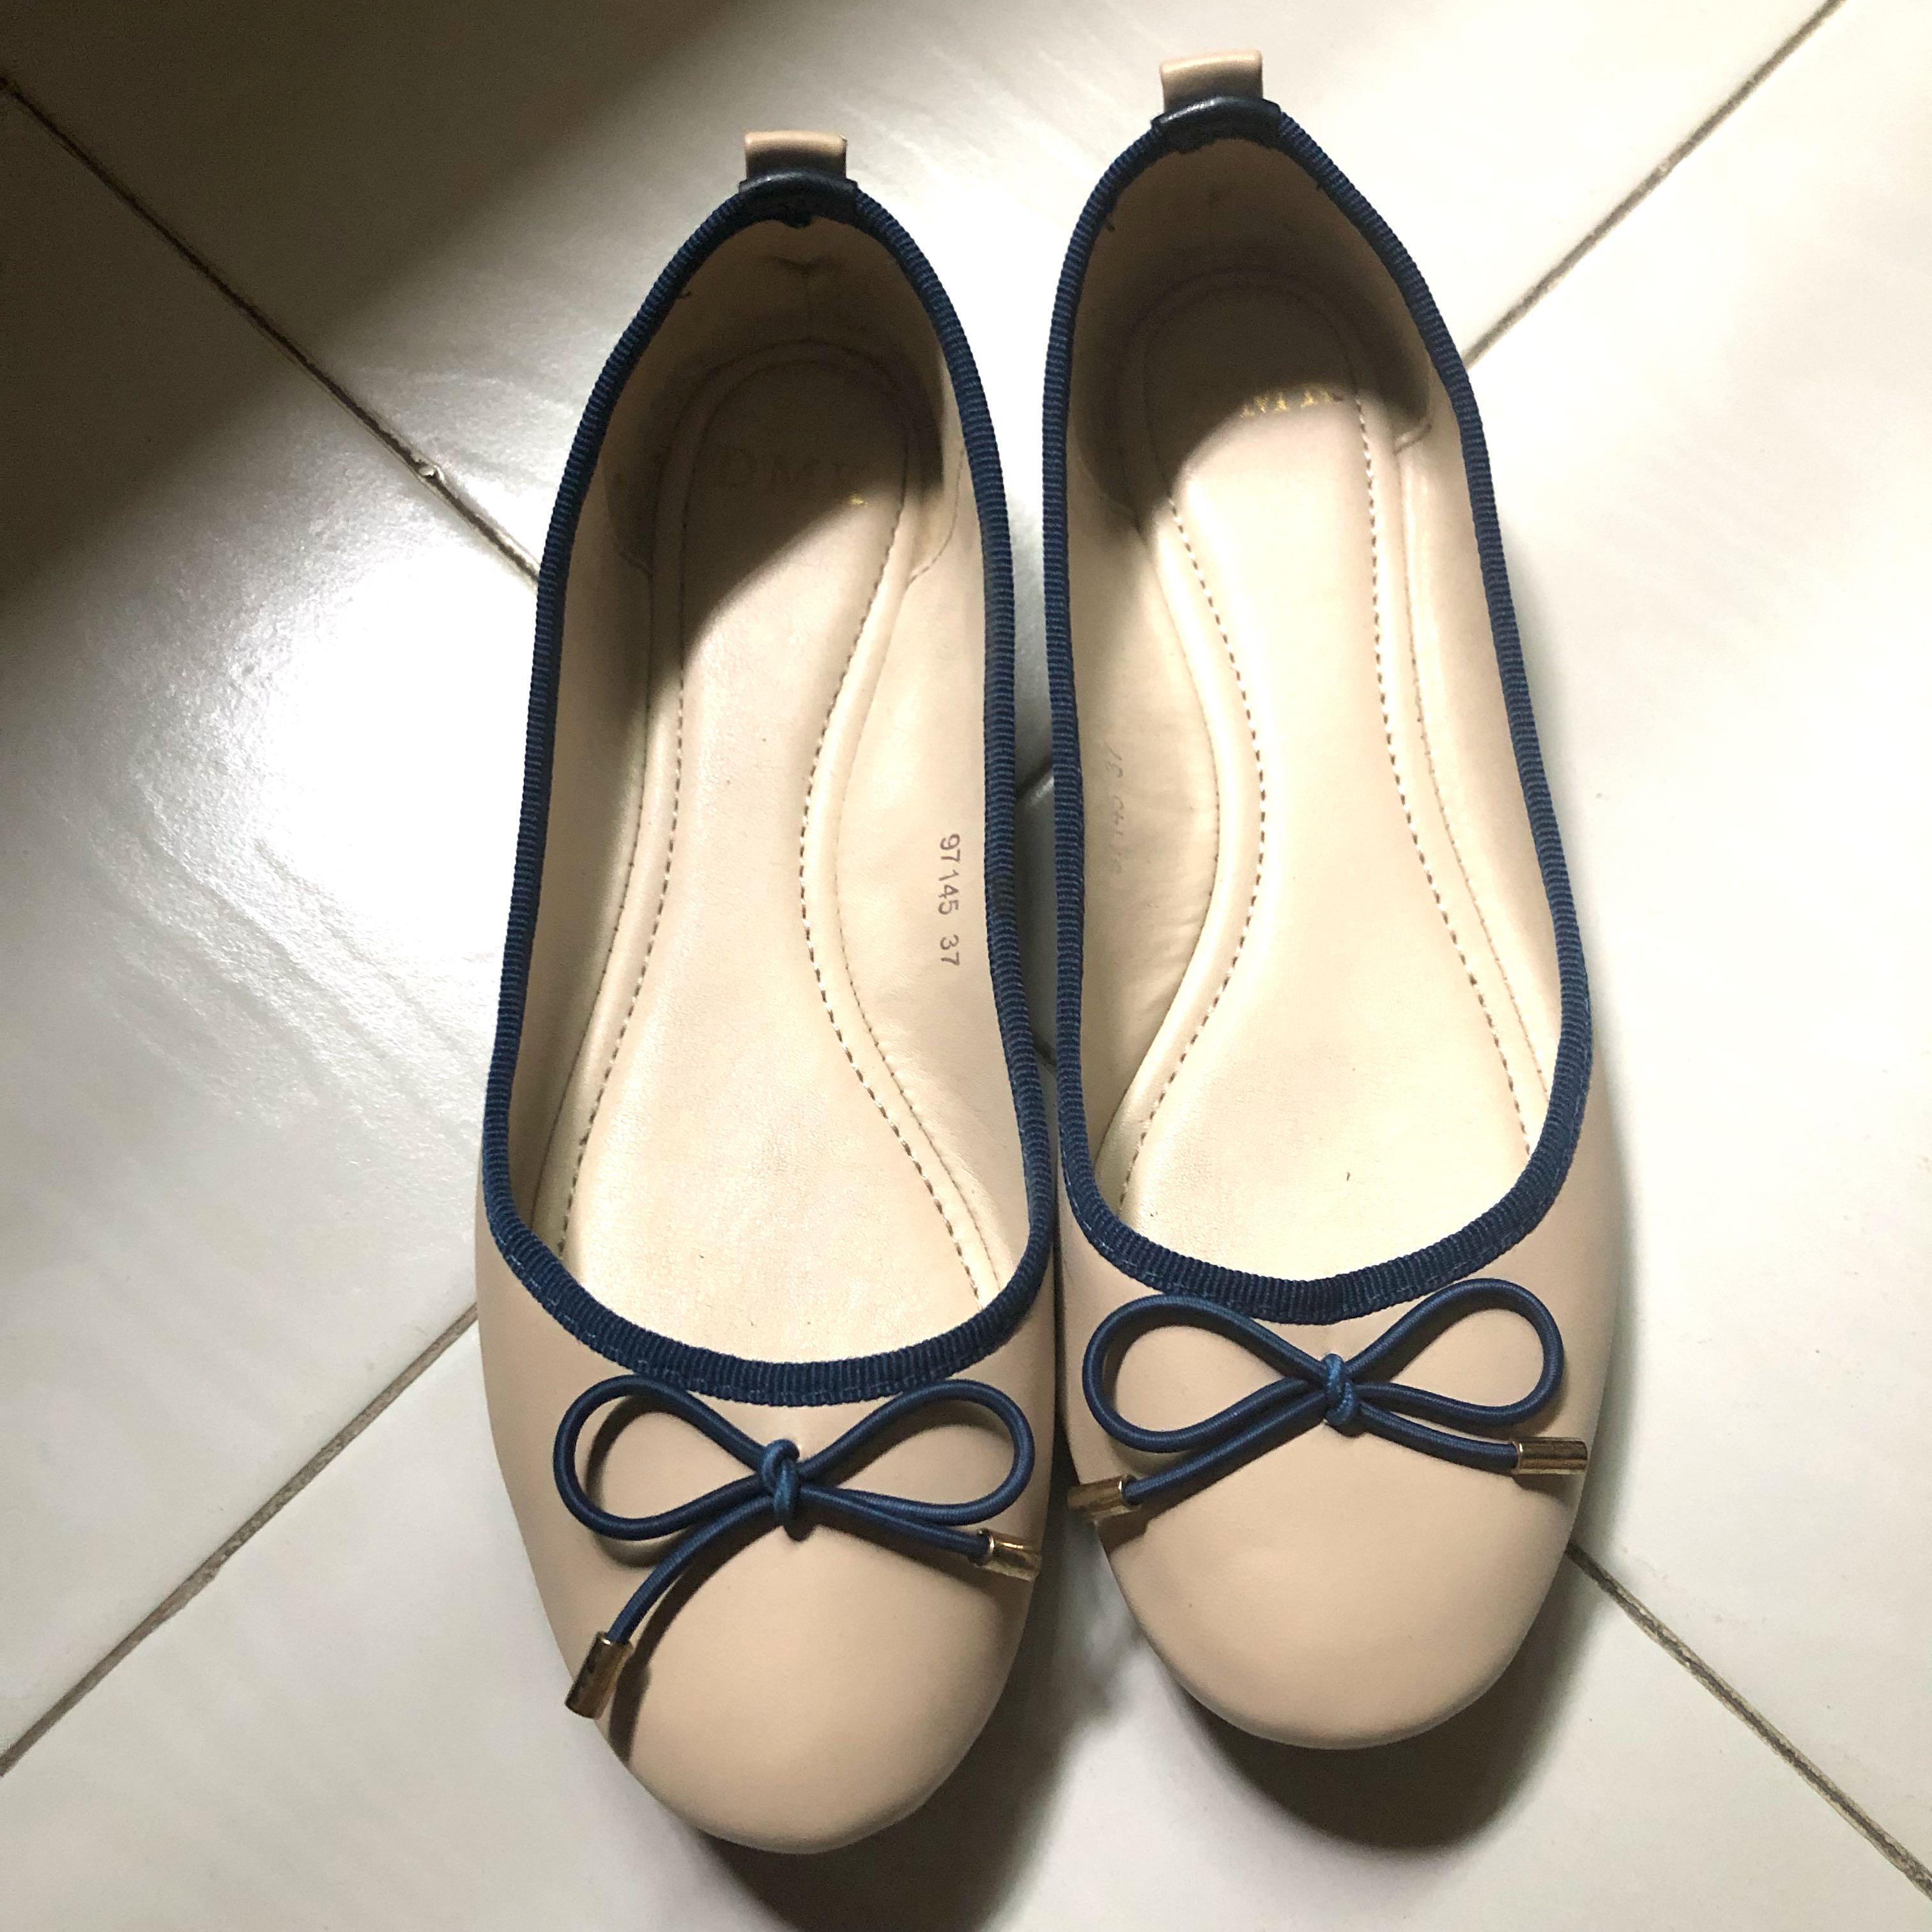 a515c9f841dfae Home · Women s Fashion · Shoes · Flats   Sandals. photo photo photo